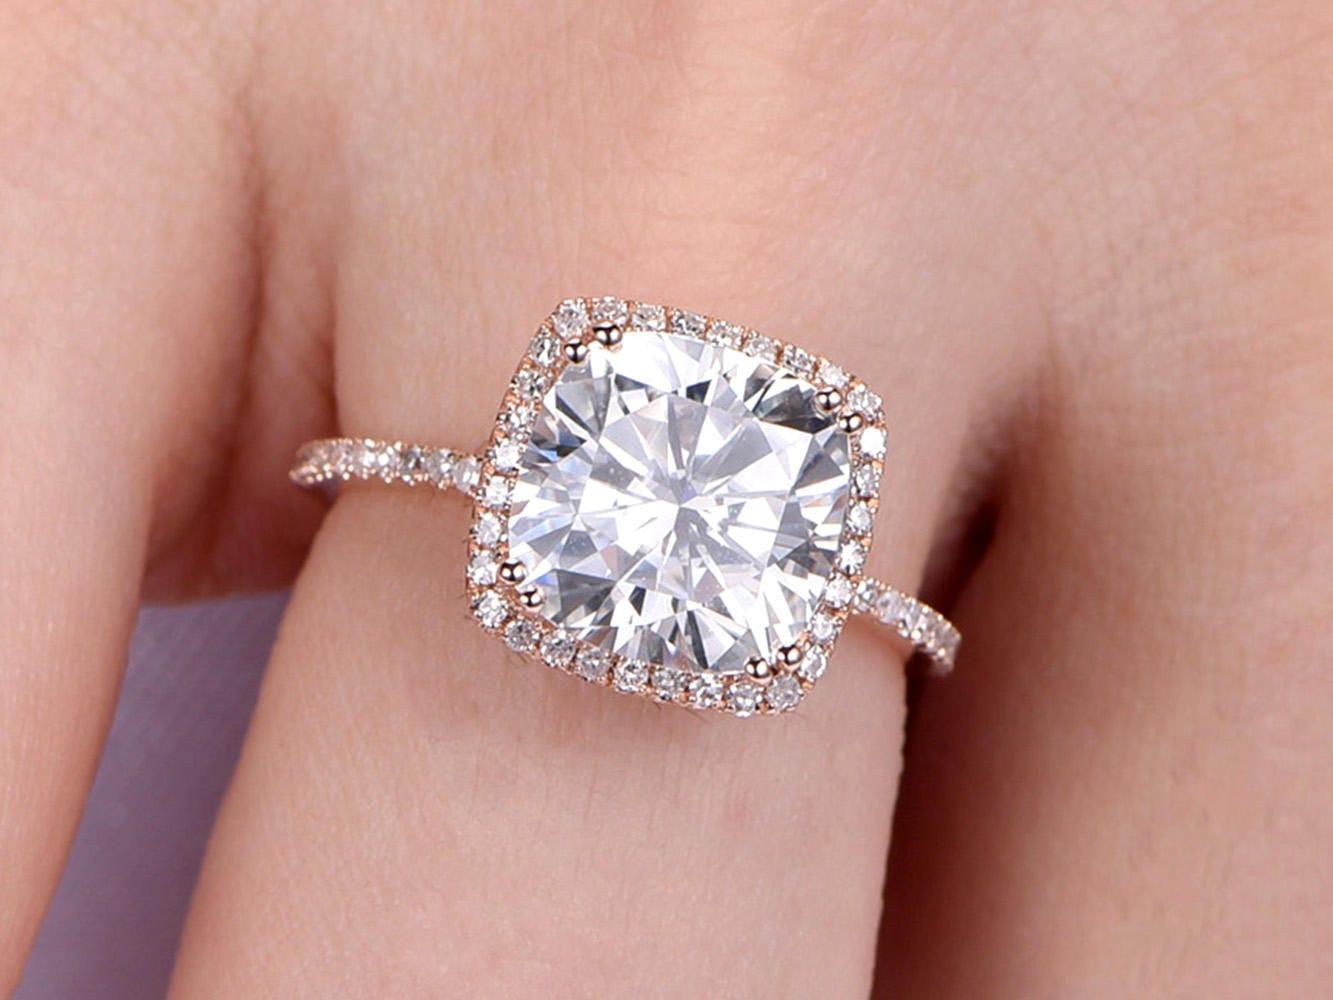 Moissanite Engagement Ring 9mm Cushion Cut Moissanite Wedding Ring ...